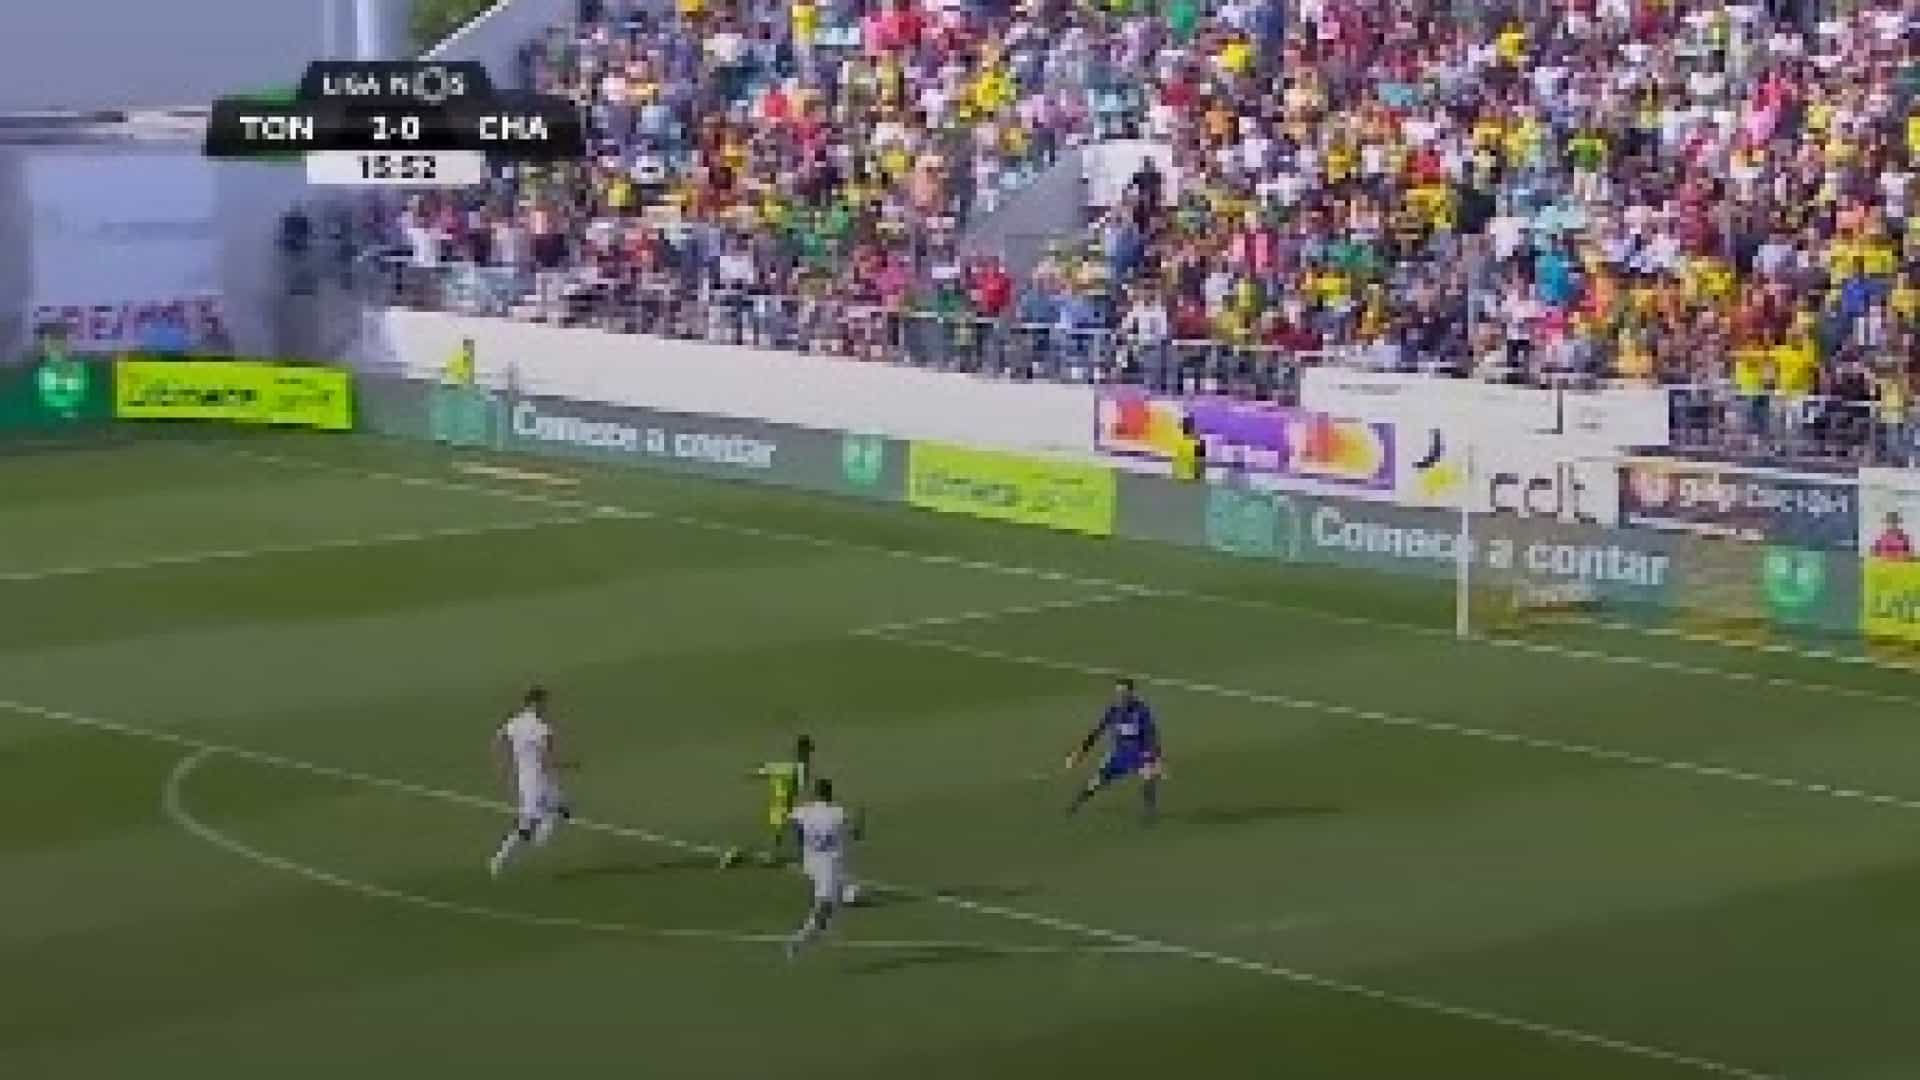 Murillo mostra sangue frio no terceiro golo do Tondela ao Chaves